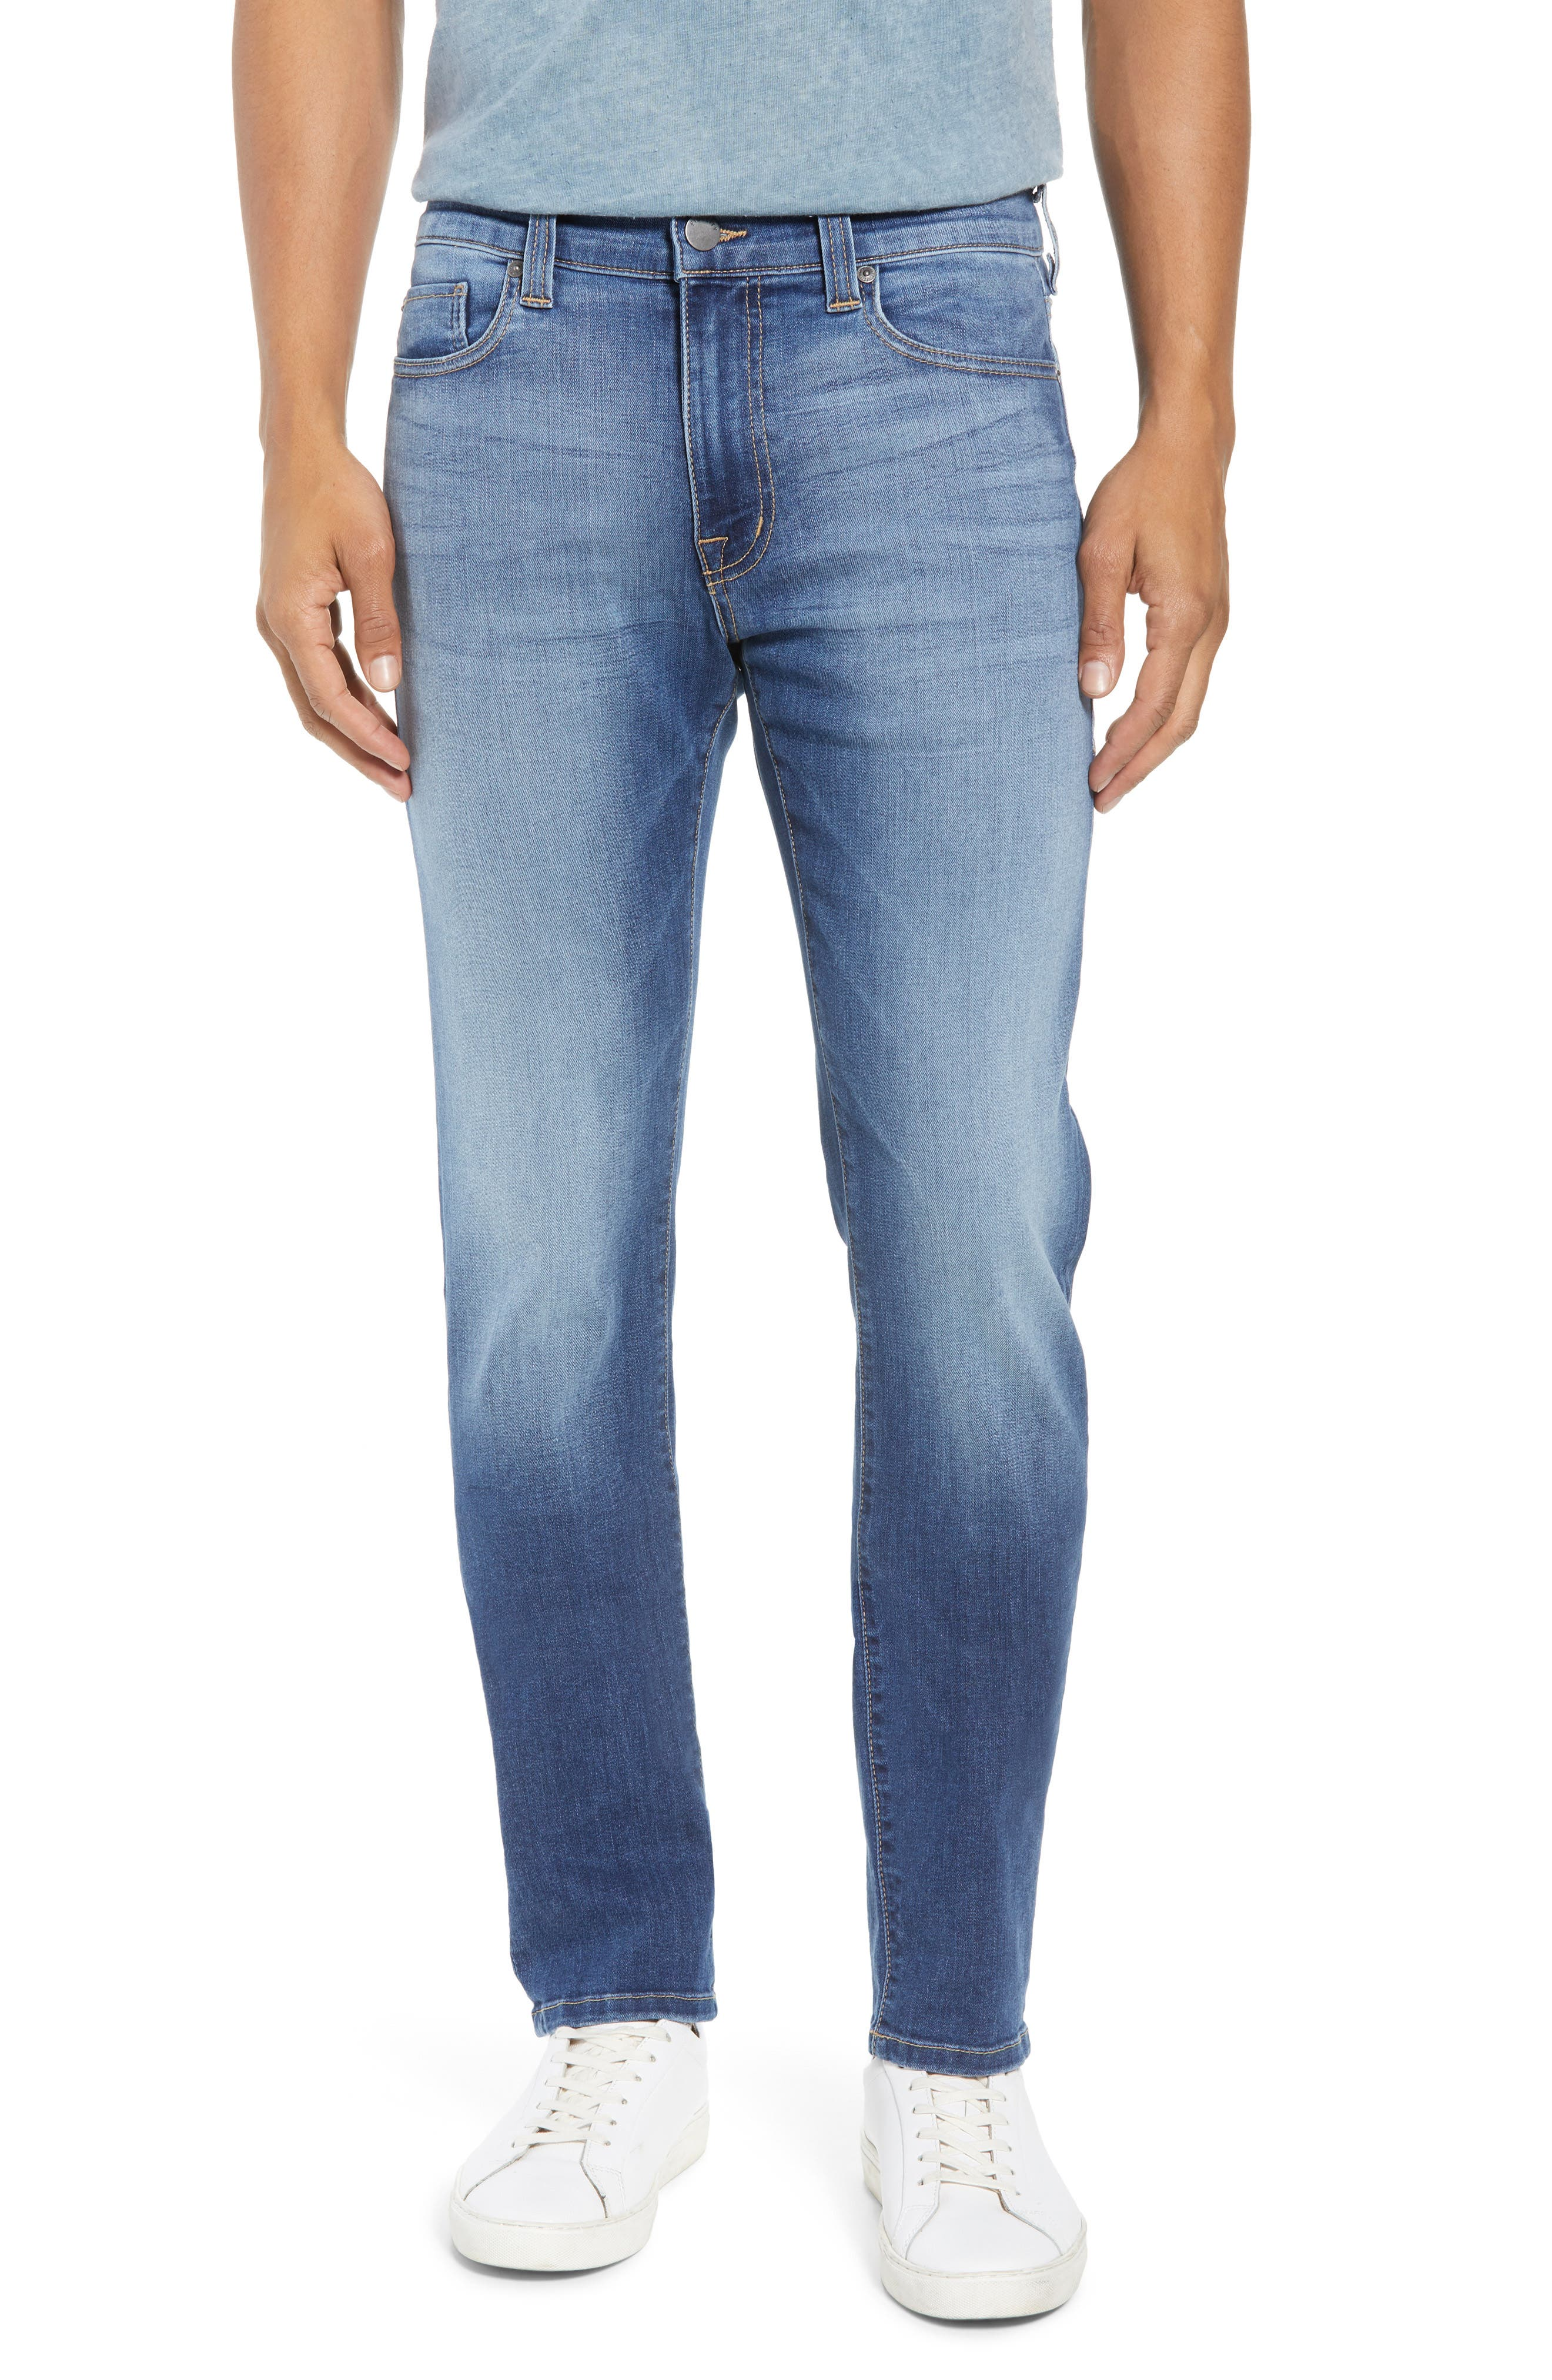 Torino Slim Fit Jeans,                             Main thumbnail 1, color,